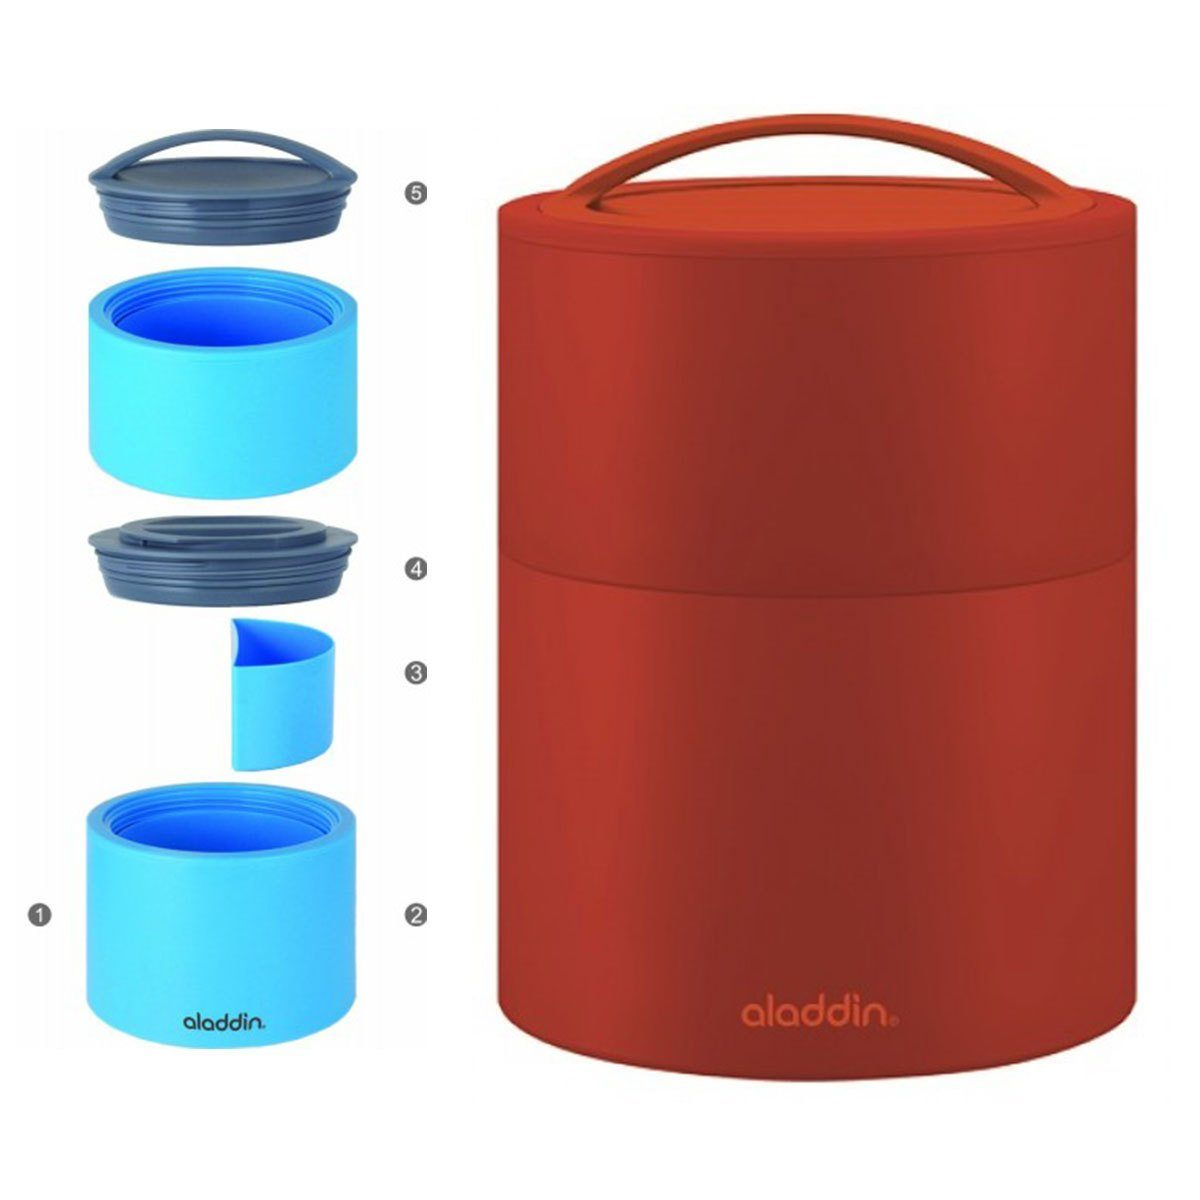 aladdin Aladdin Bento Lunchbox 0.95l, tomato